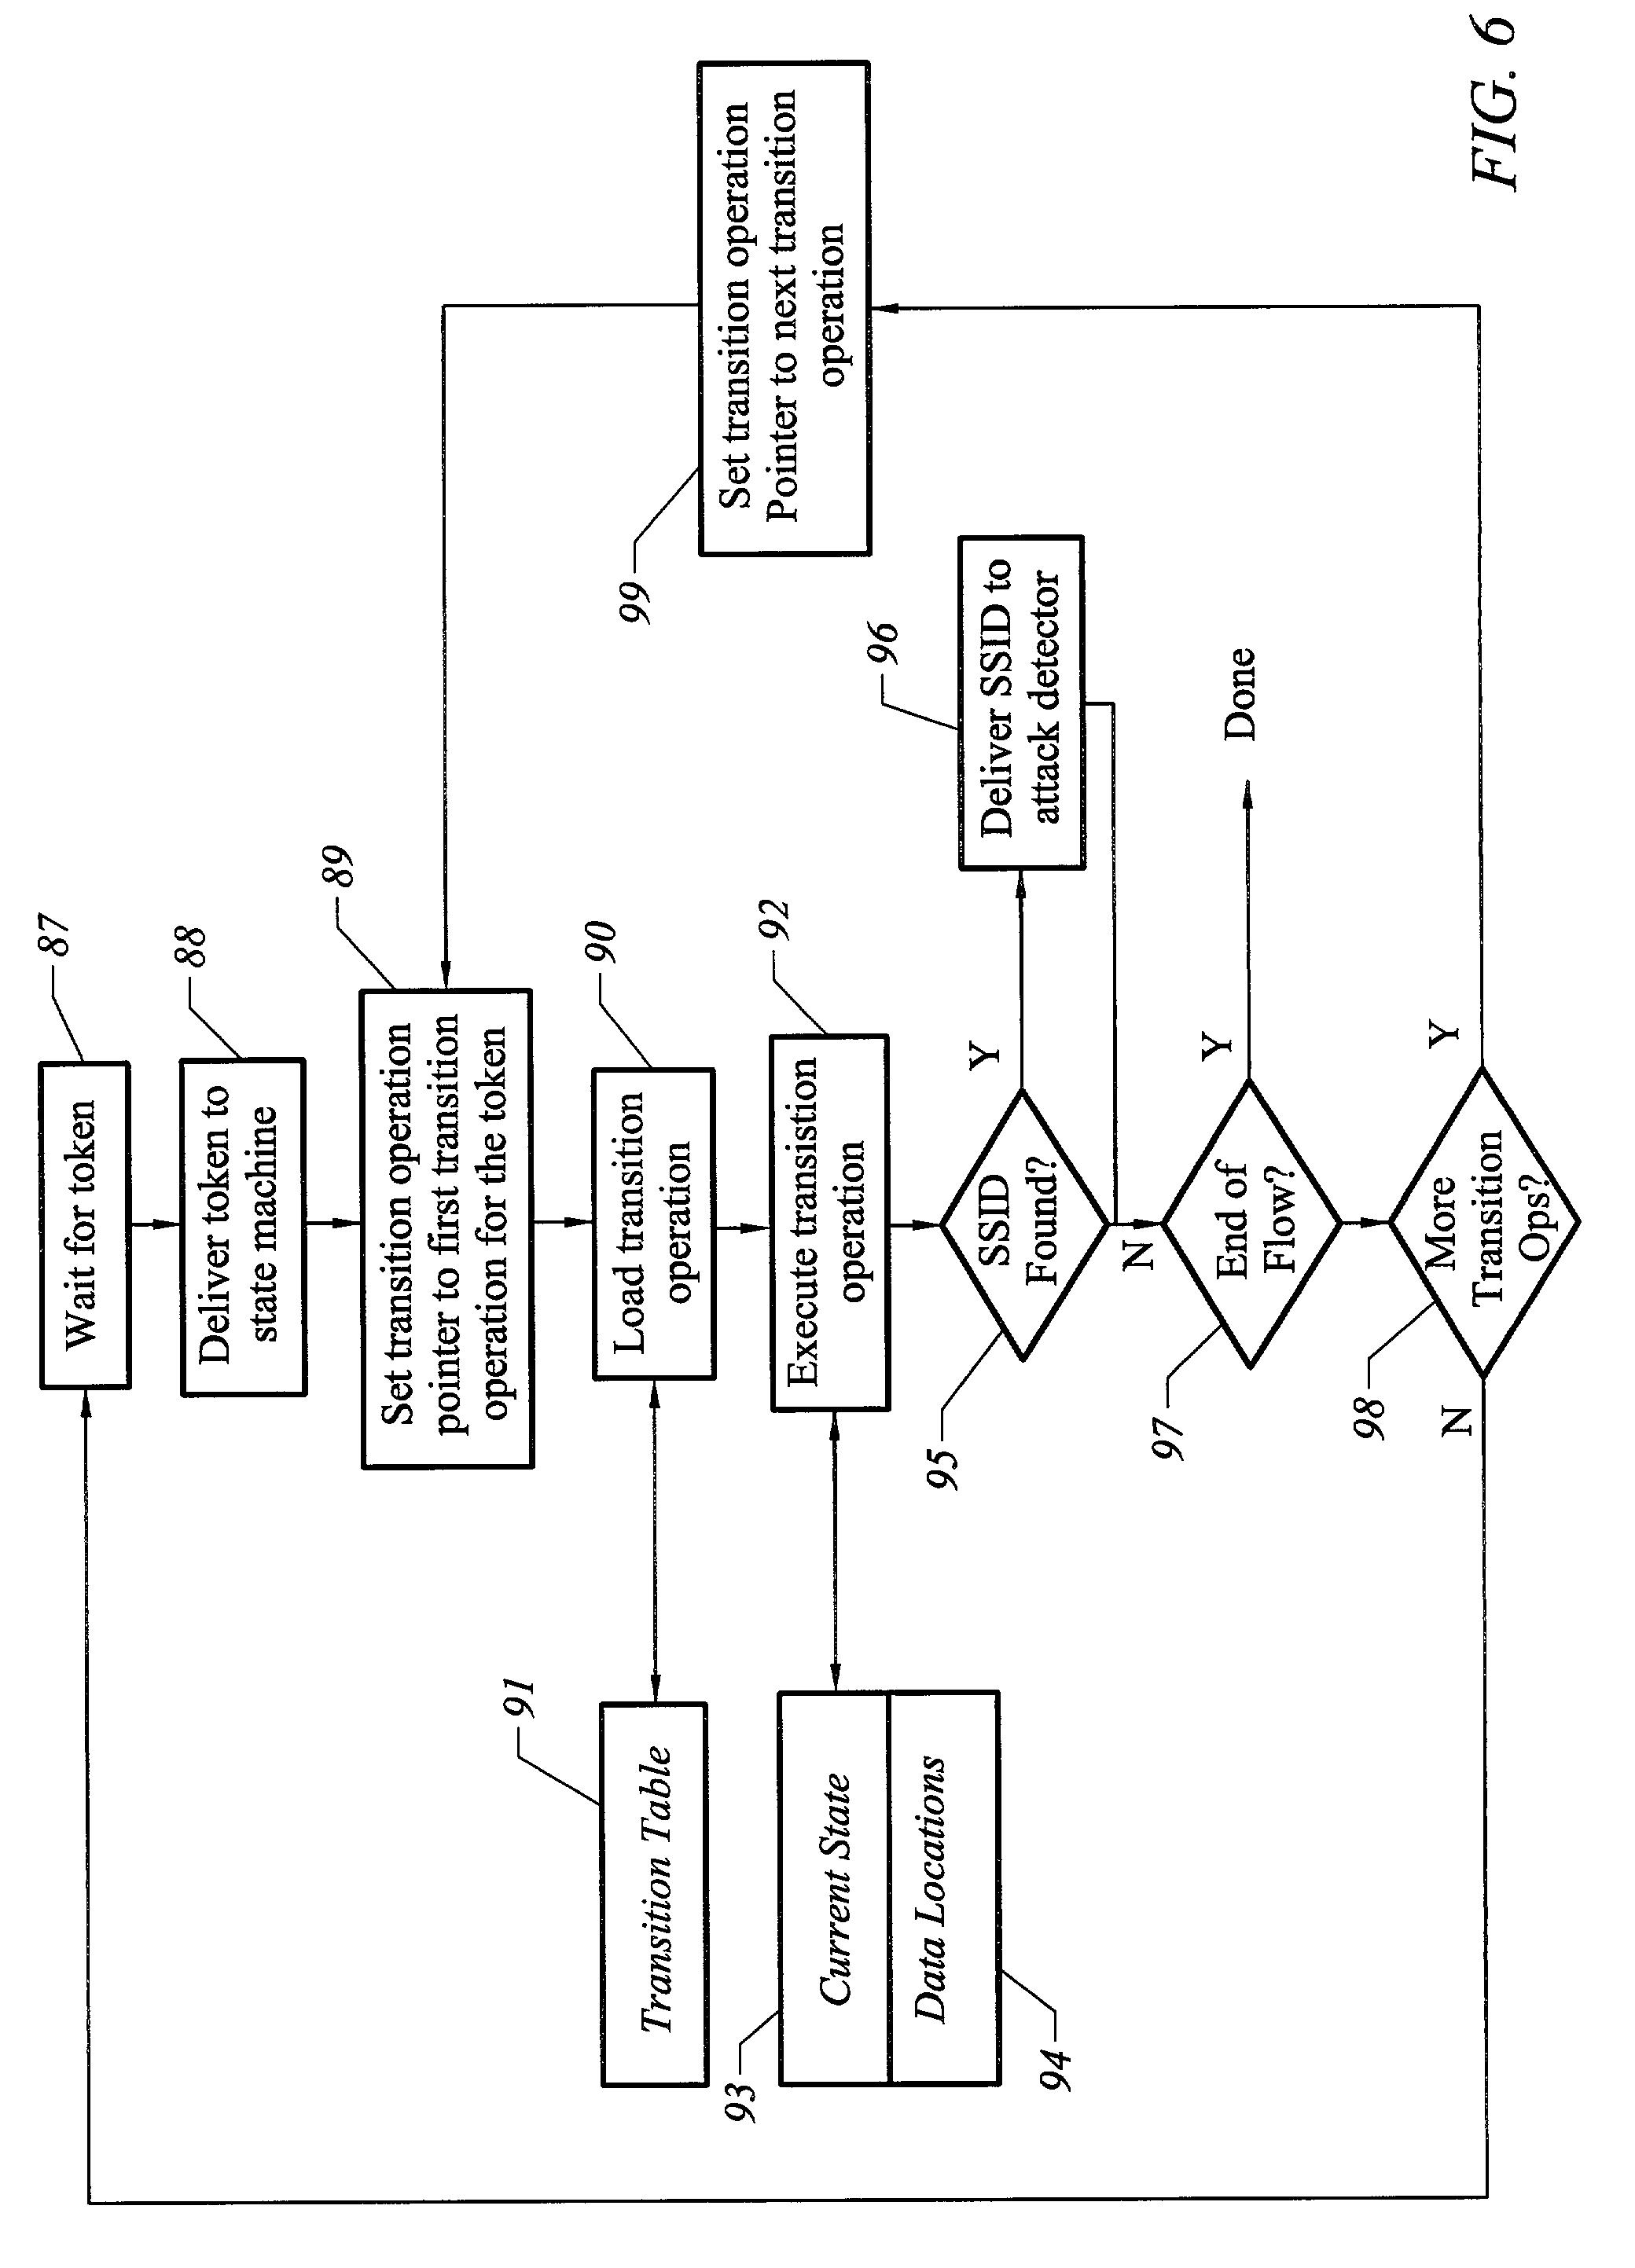 Xantrex Charge Controller Wiring Diagram - Wiring Diagrams Dock